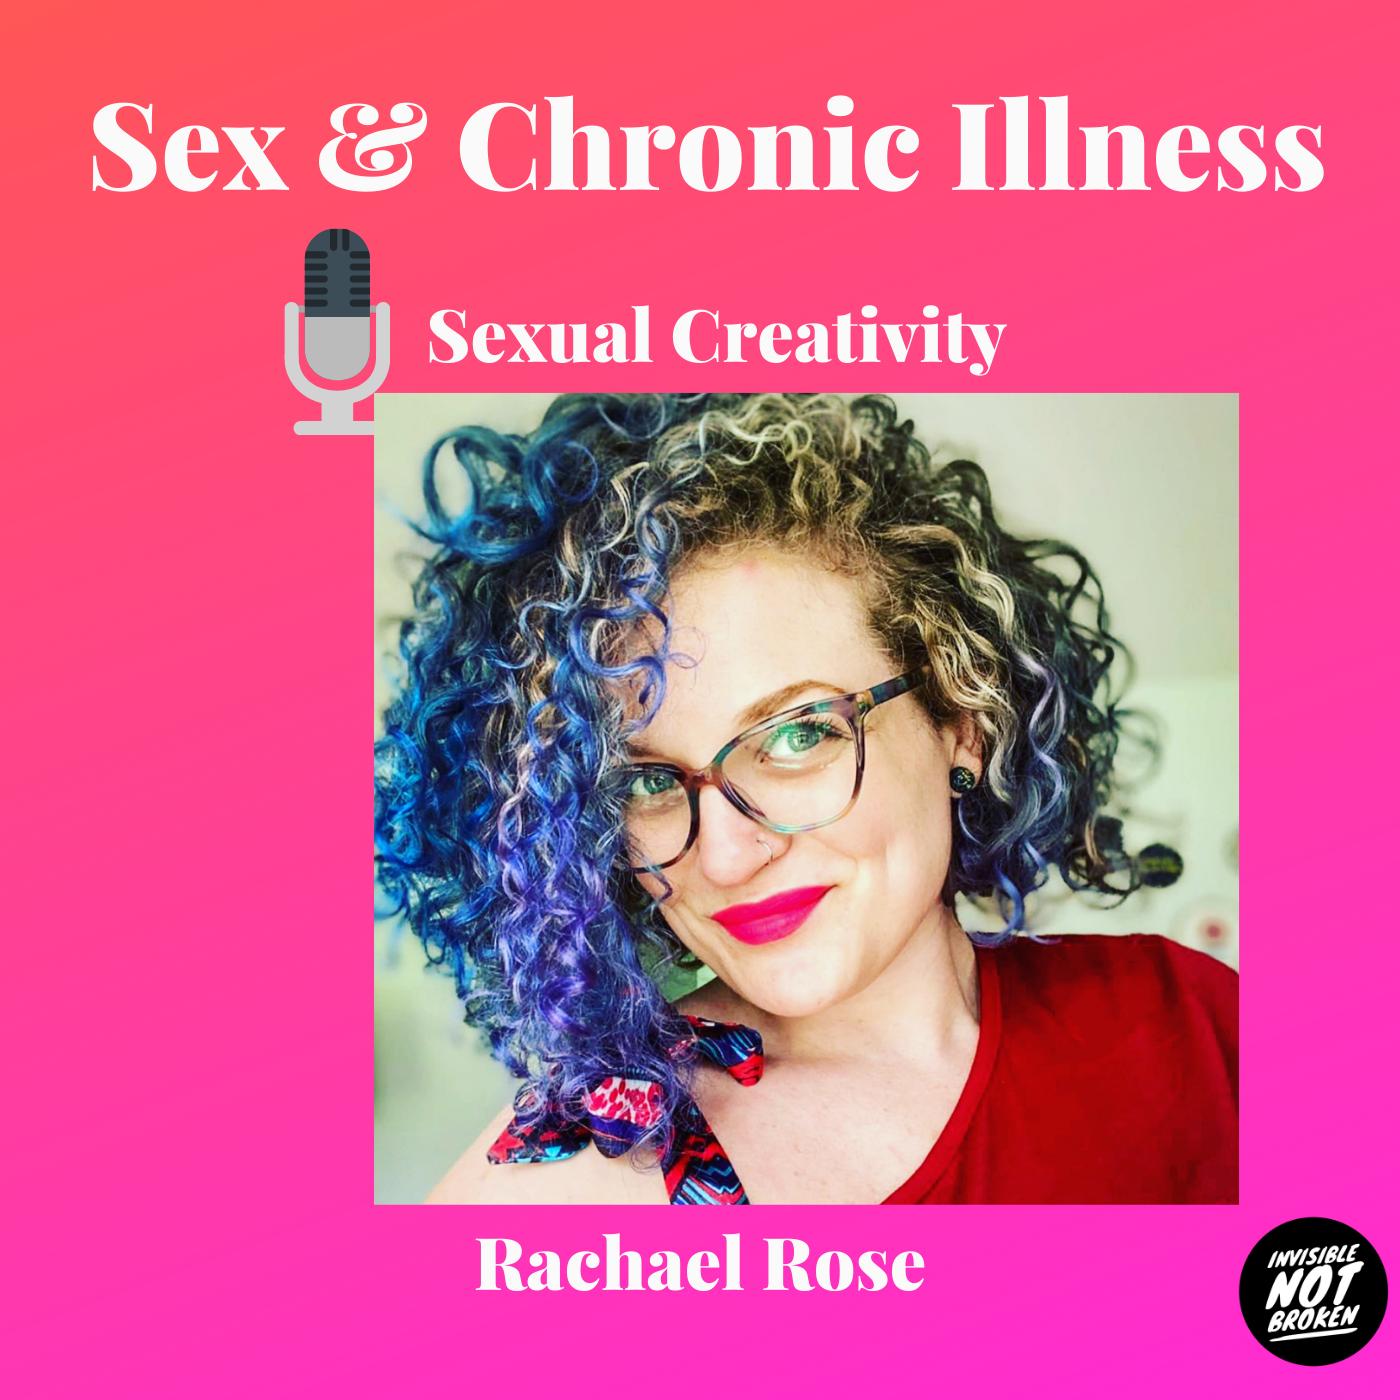 Sex and Chronic Illness - Episode 6: Sexual Creativity with Chronic Illness: Rachael Rose